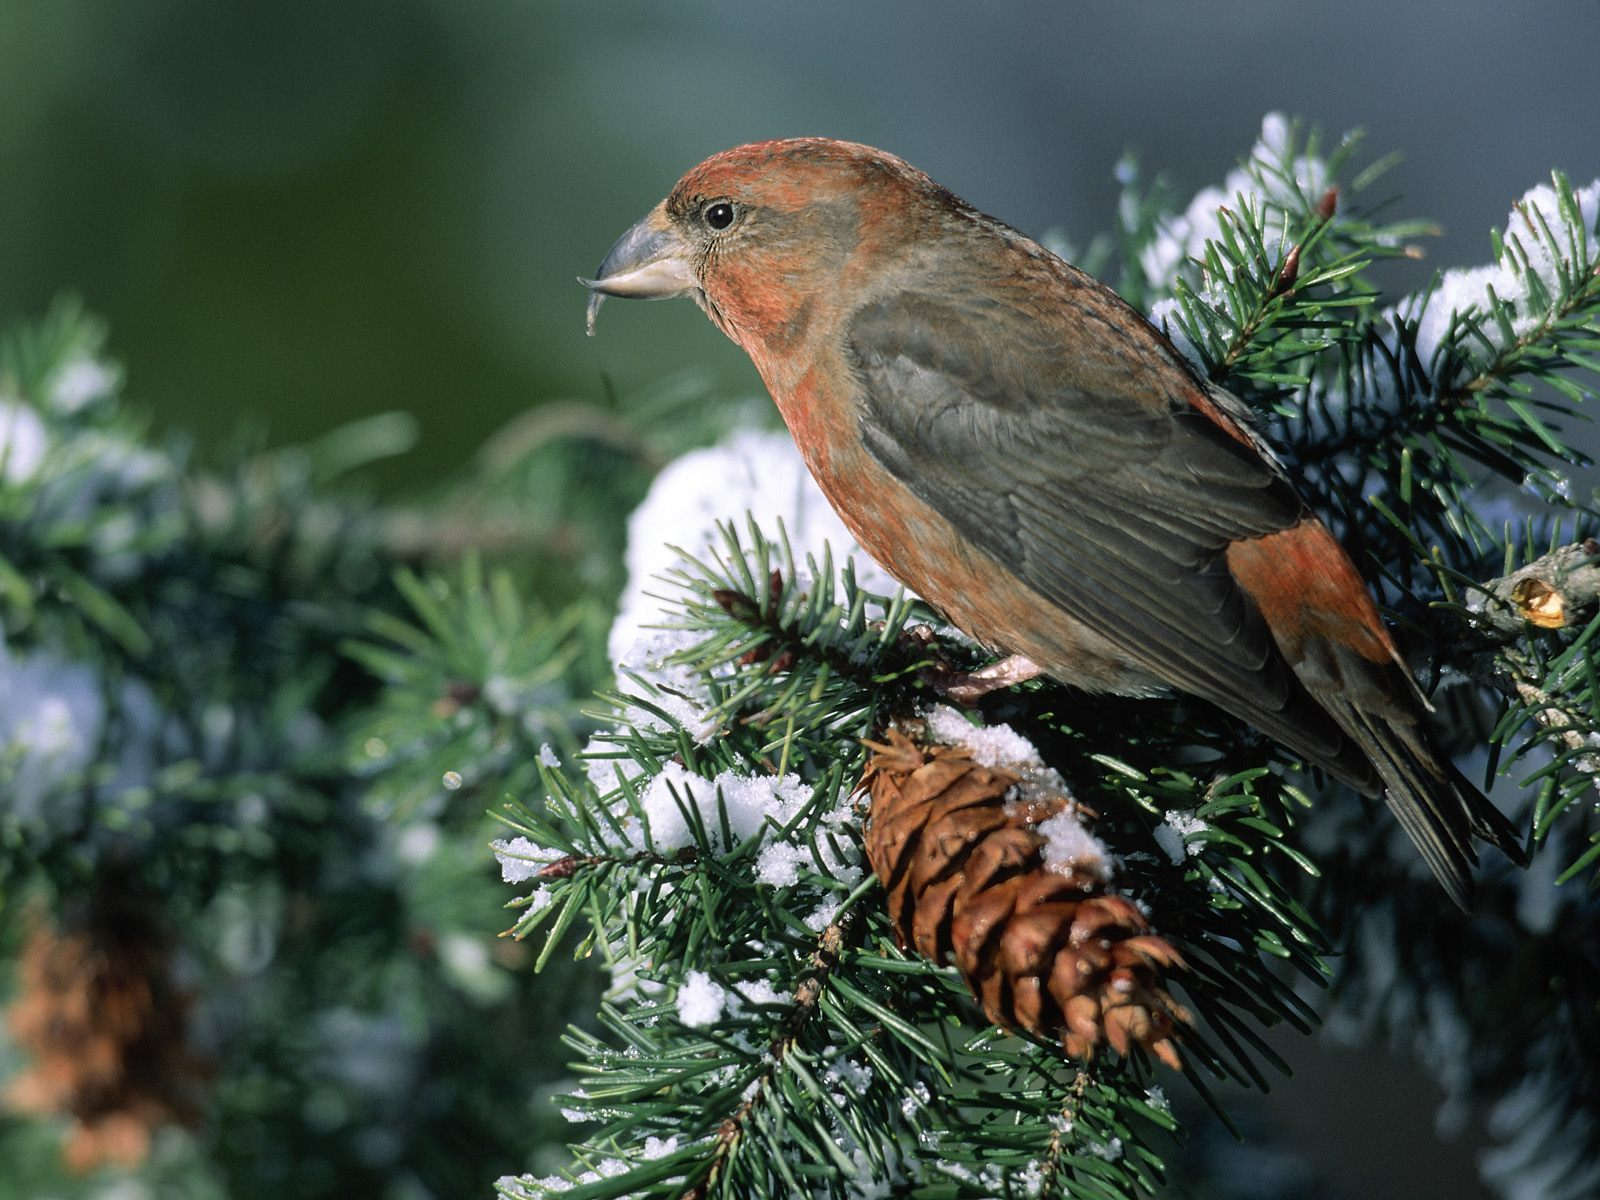 http://3.bp.blogspot.com/_TcwbPuj2SZ0/TFMg9OihwrI/AAAAAAAARv4/yGX6yCH_eaw/s1600/Crossbill-Bird-Feeding-on-Fir-Cones.jpg